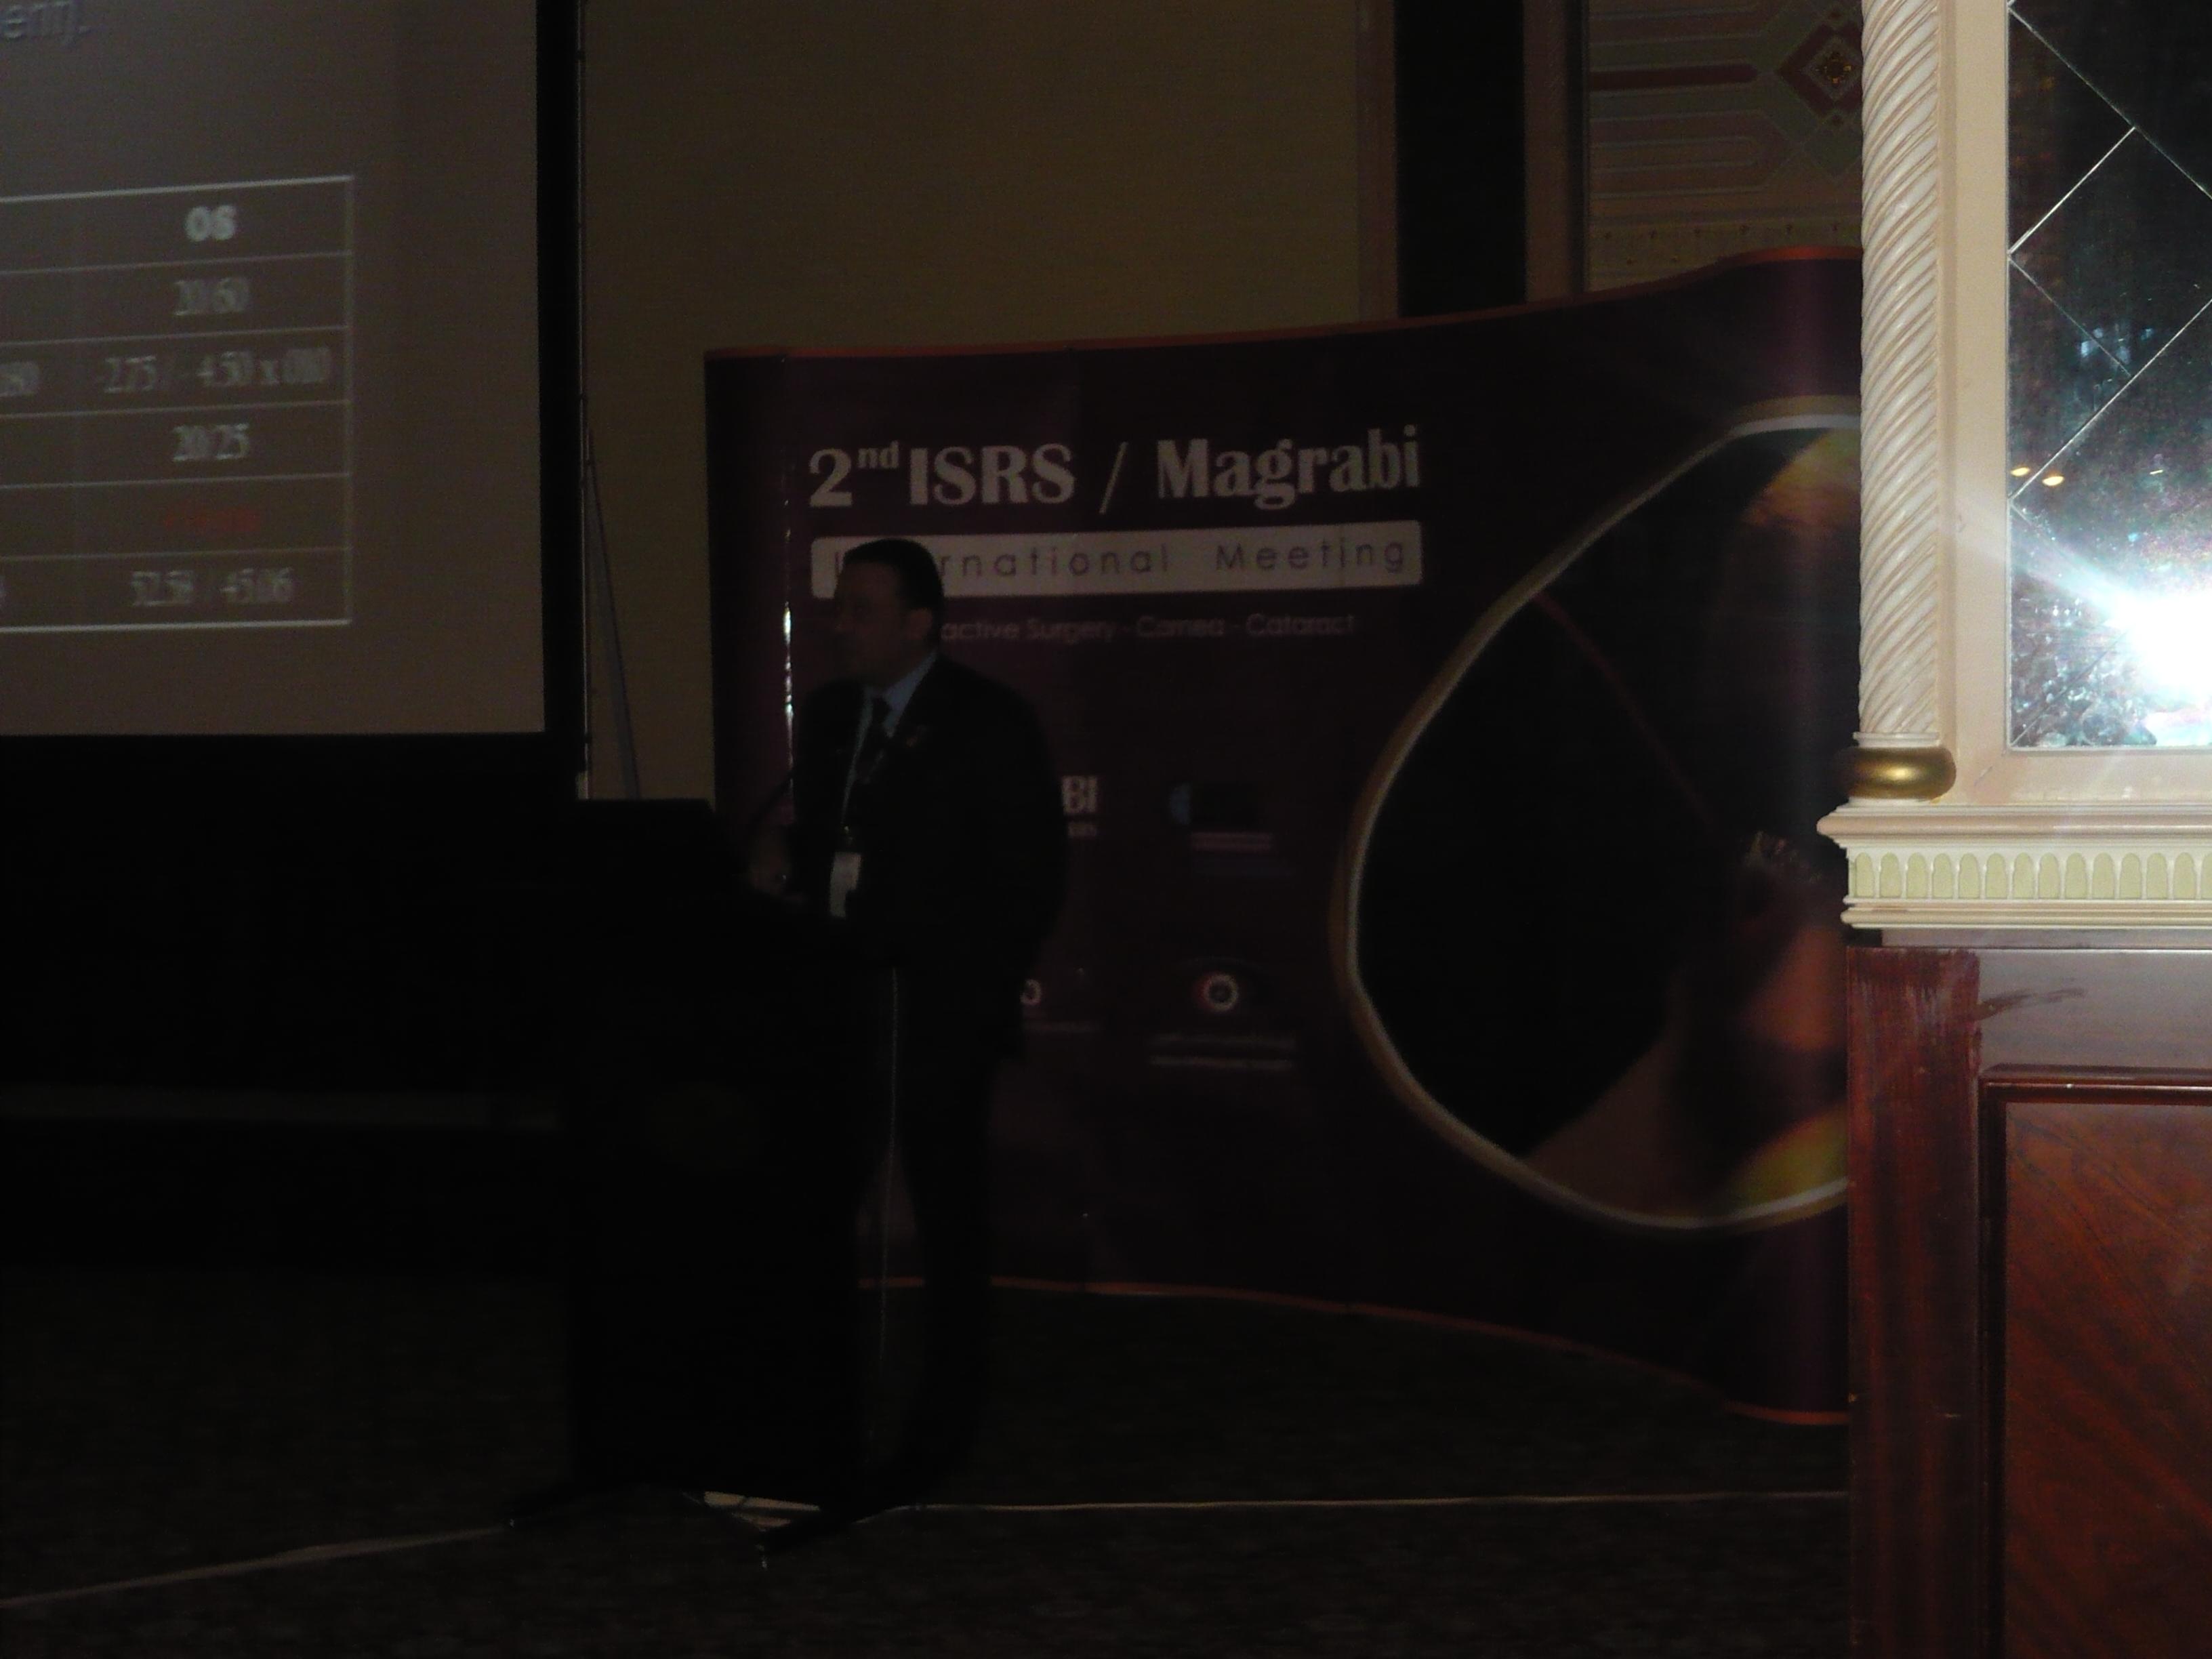 MAGRABI / ISRS 2011 May, Muscat – OMAN | Dr Tamer O Gamaly